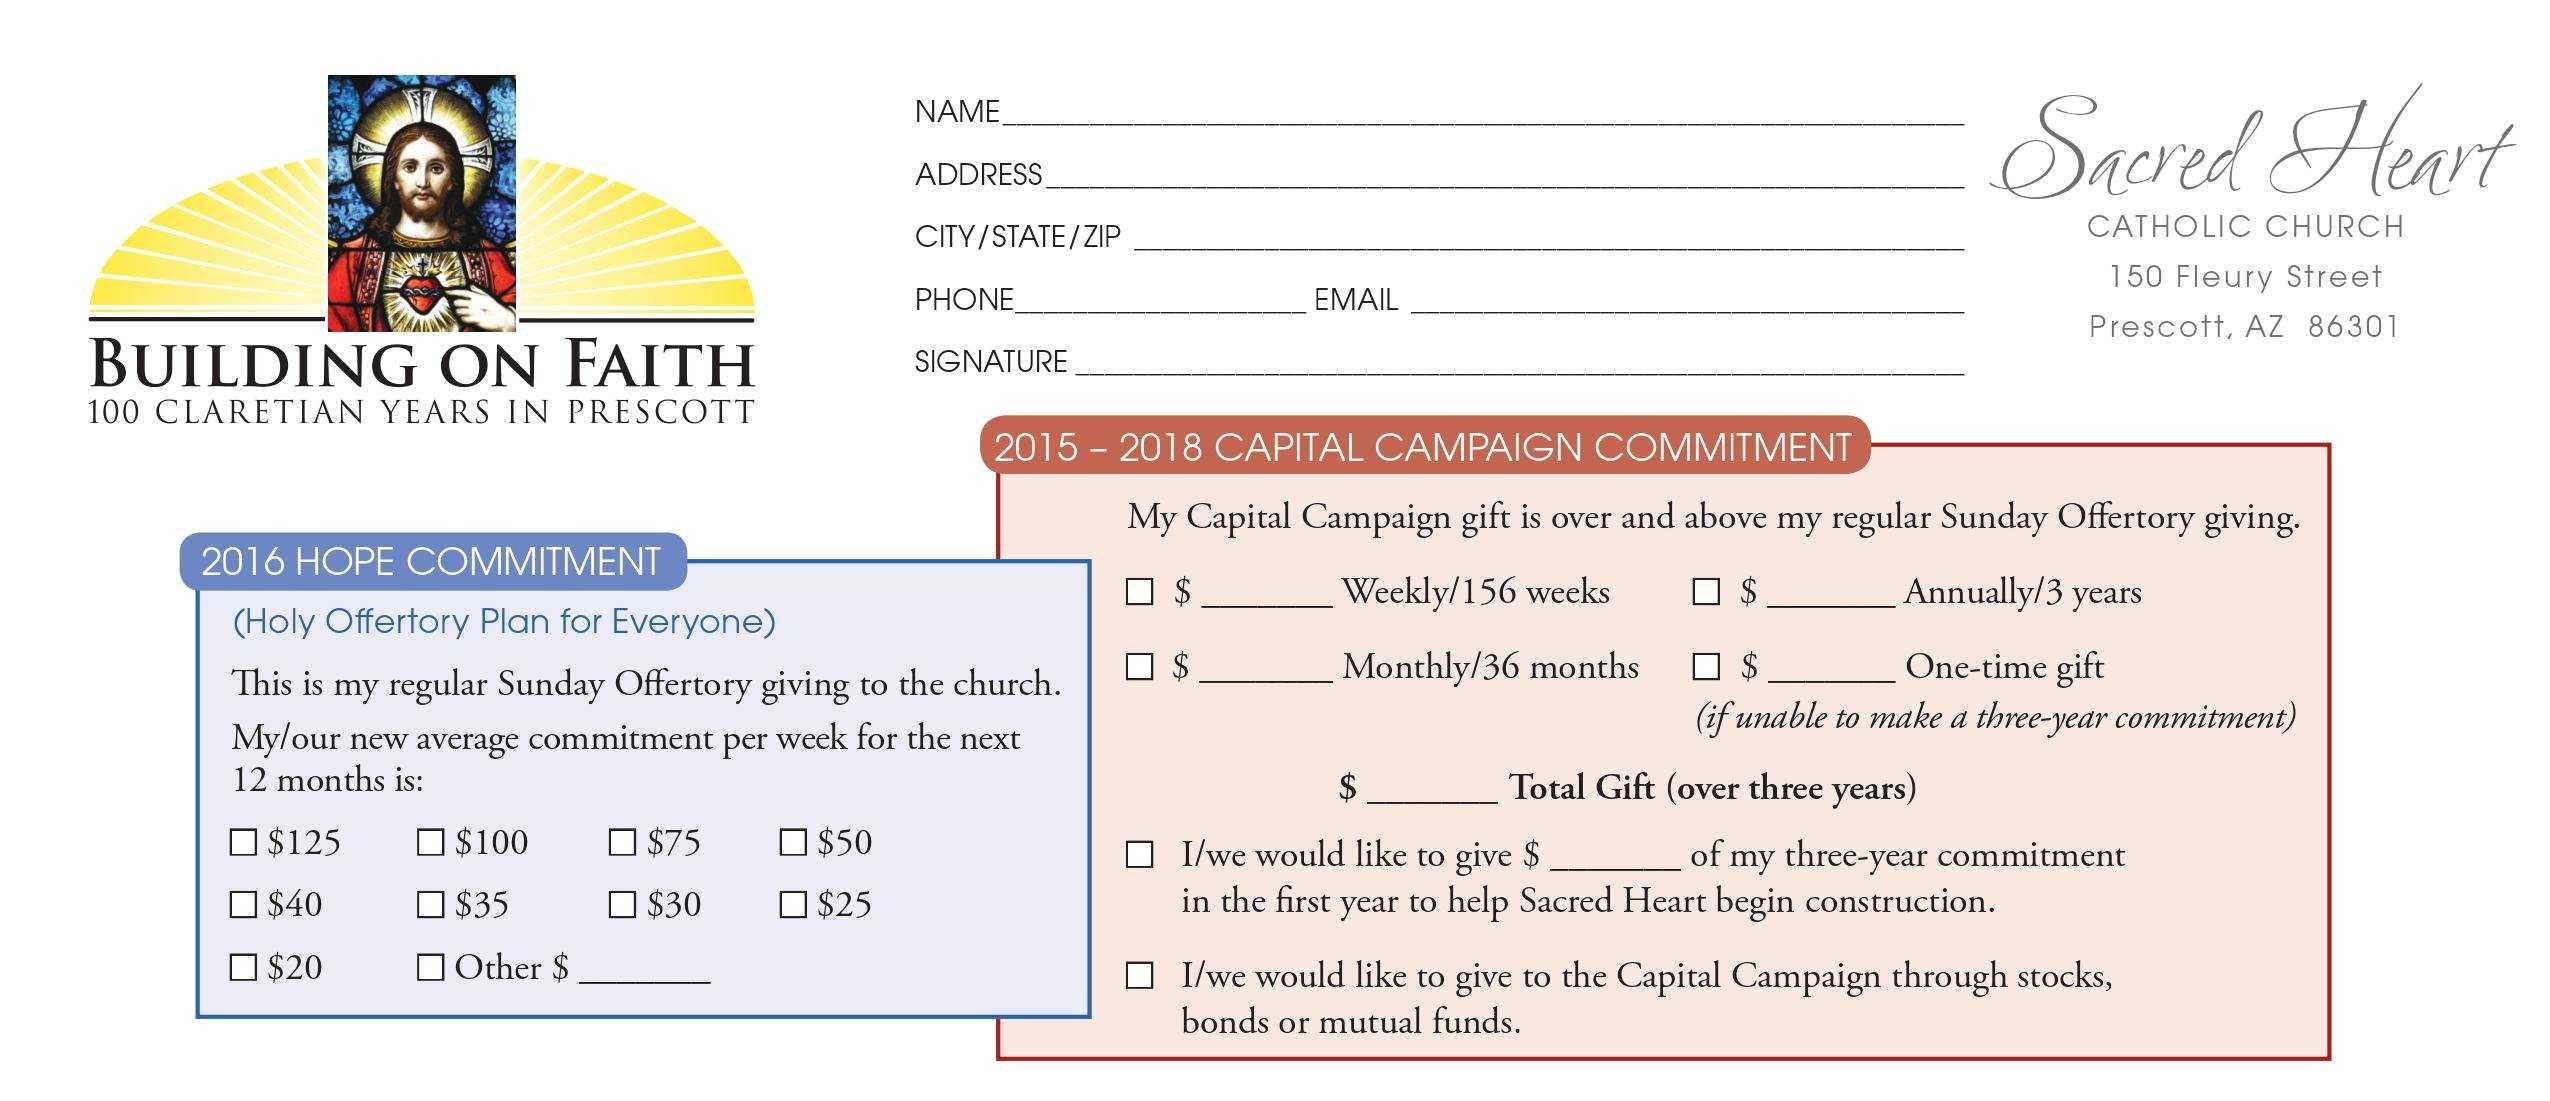 Church Capital Campaign Pledge Card Samples Regarding Pledge Card Template For Church